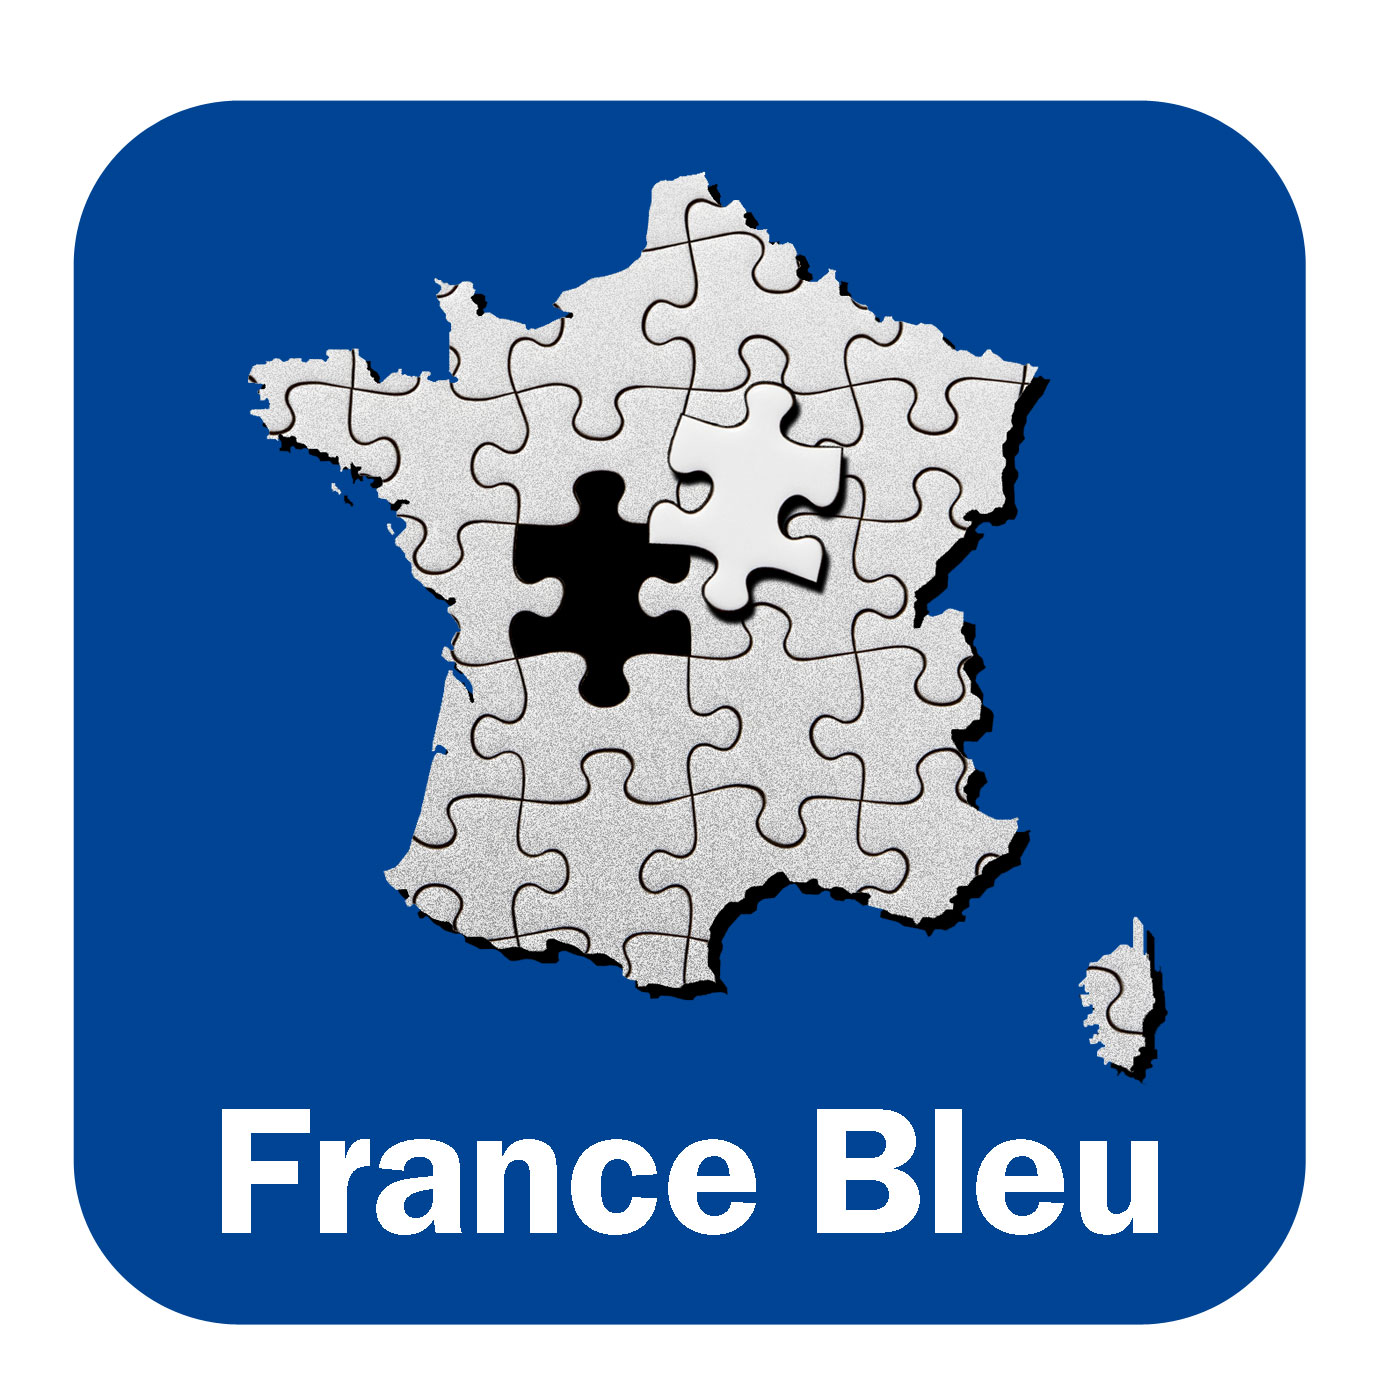 Les Producteurs Made in Poitou France Bleu Poitou